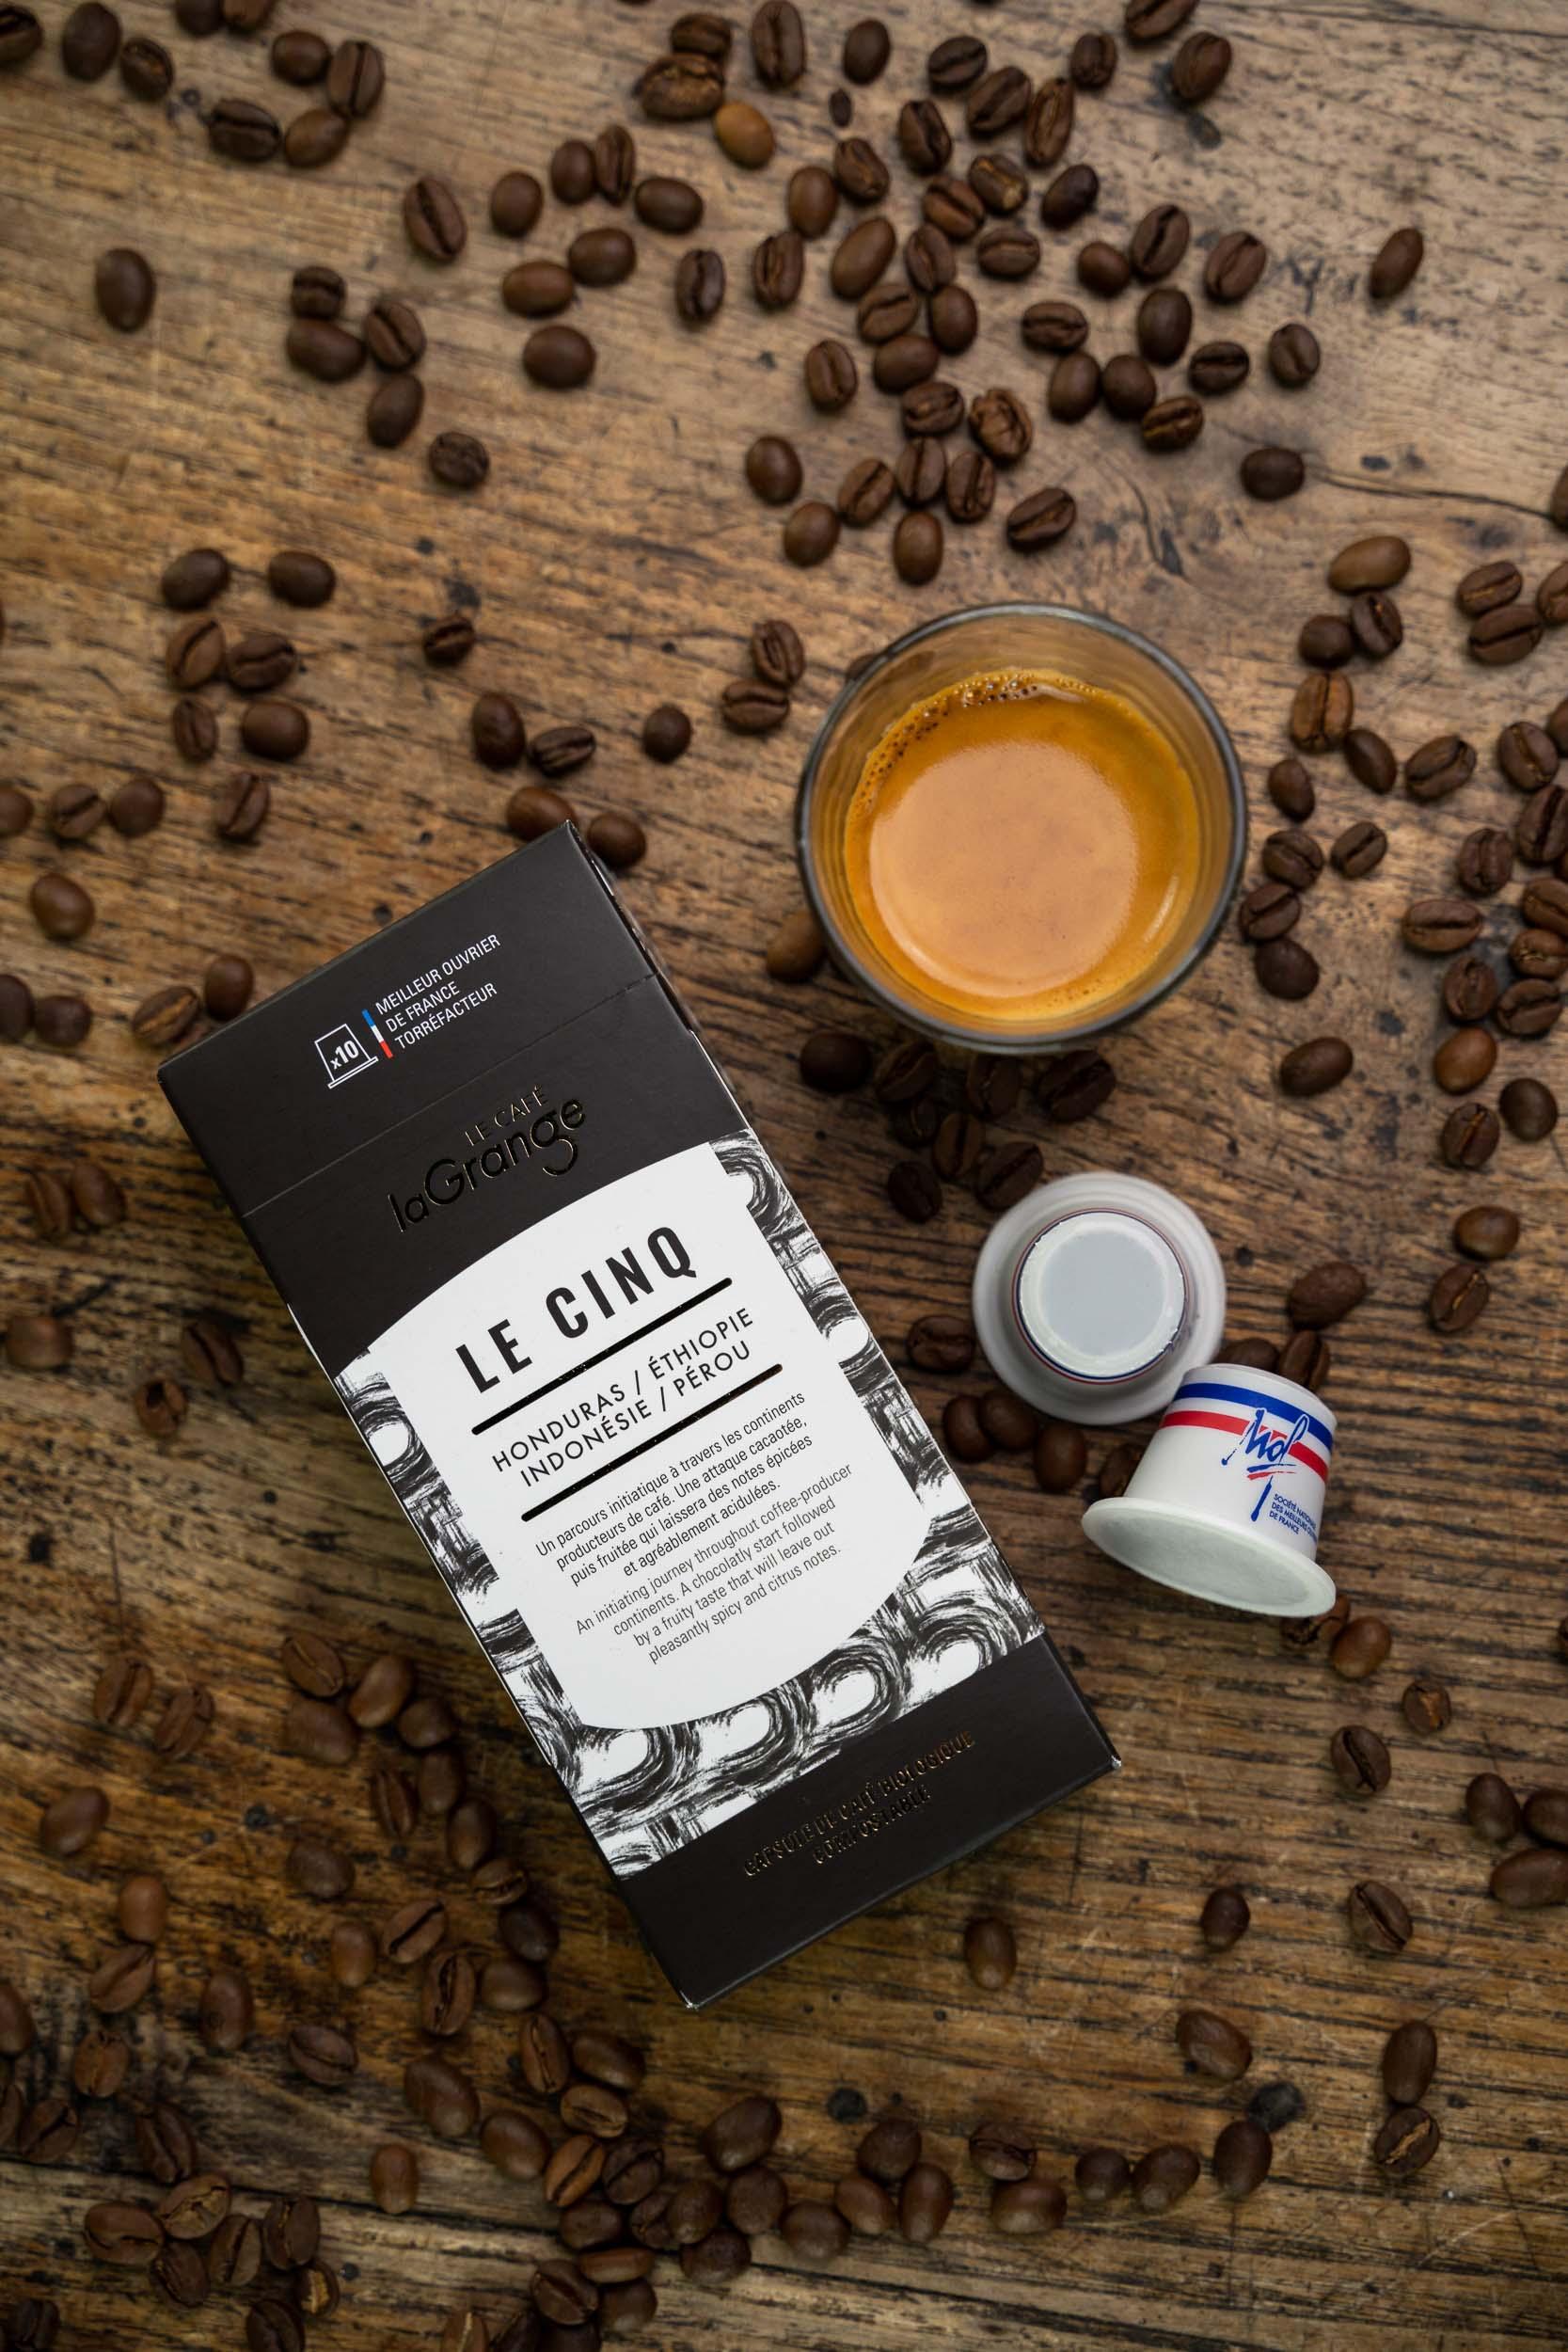 café-lecinque-lagrange-marnay-photographe-besançon-gui2raw